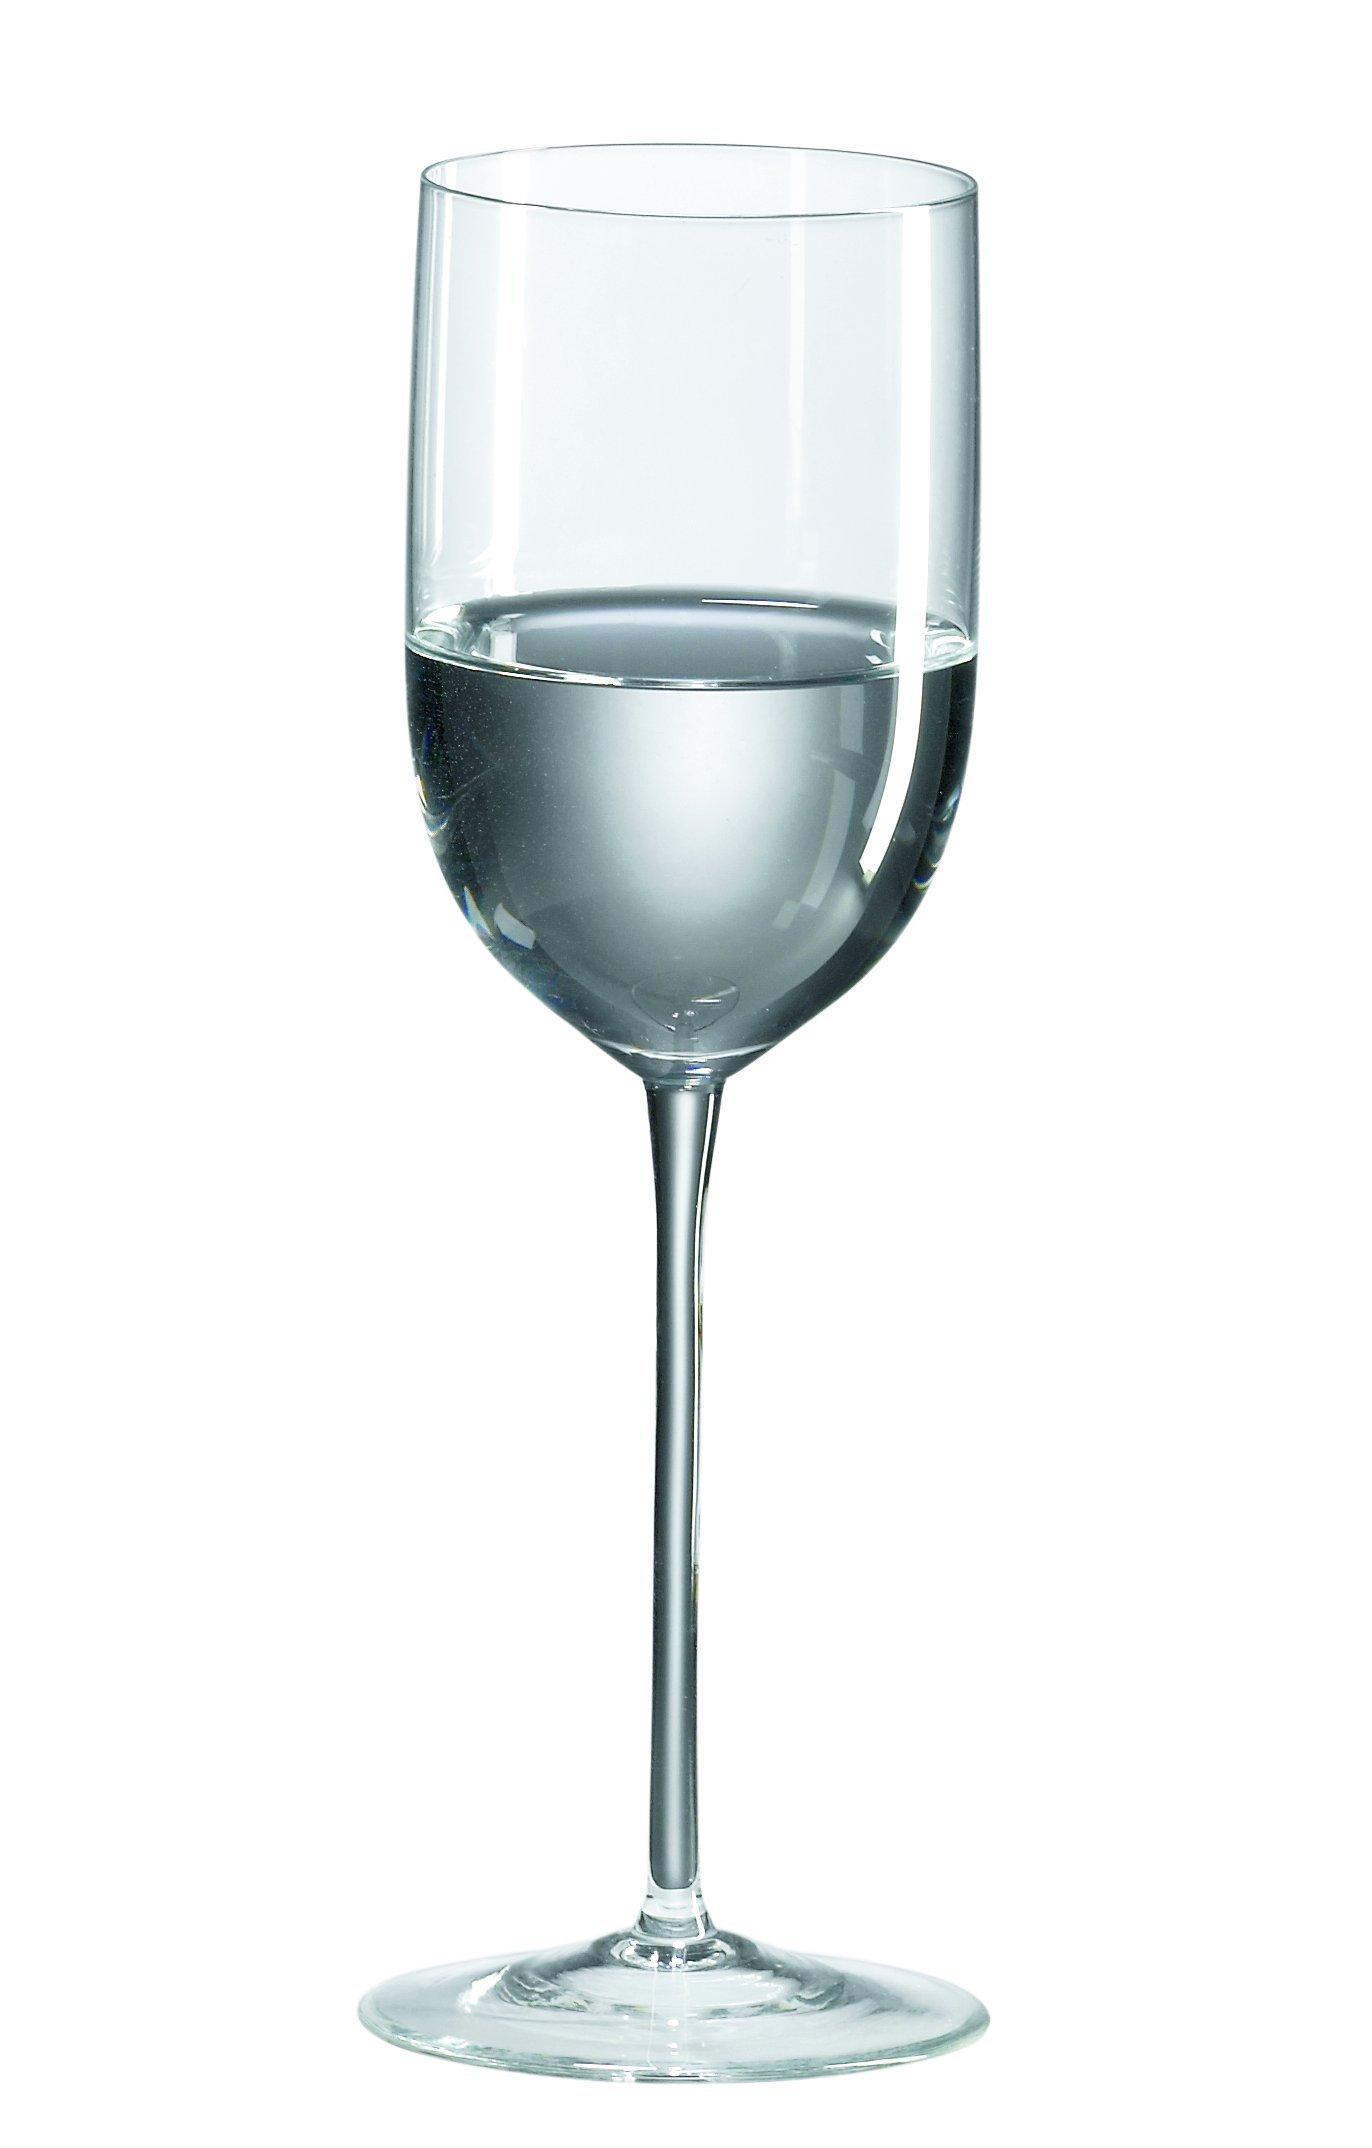 Ravenscroft Crystal Long Stem Mineral Water Glass, Set of 4 by Ravenscroft Crystal